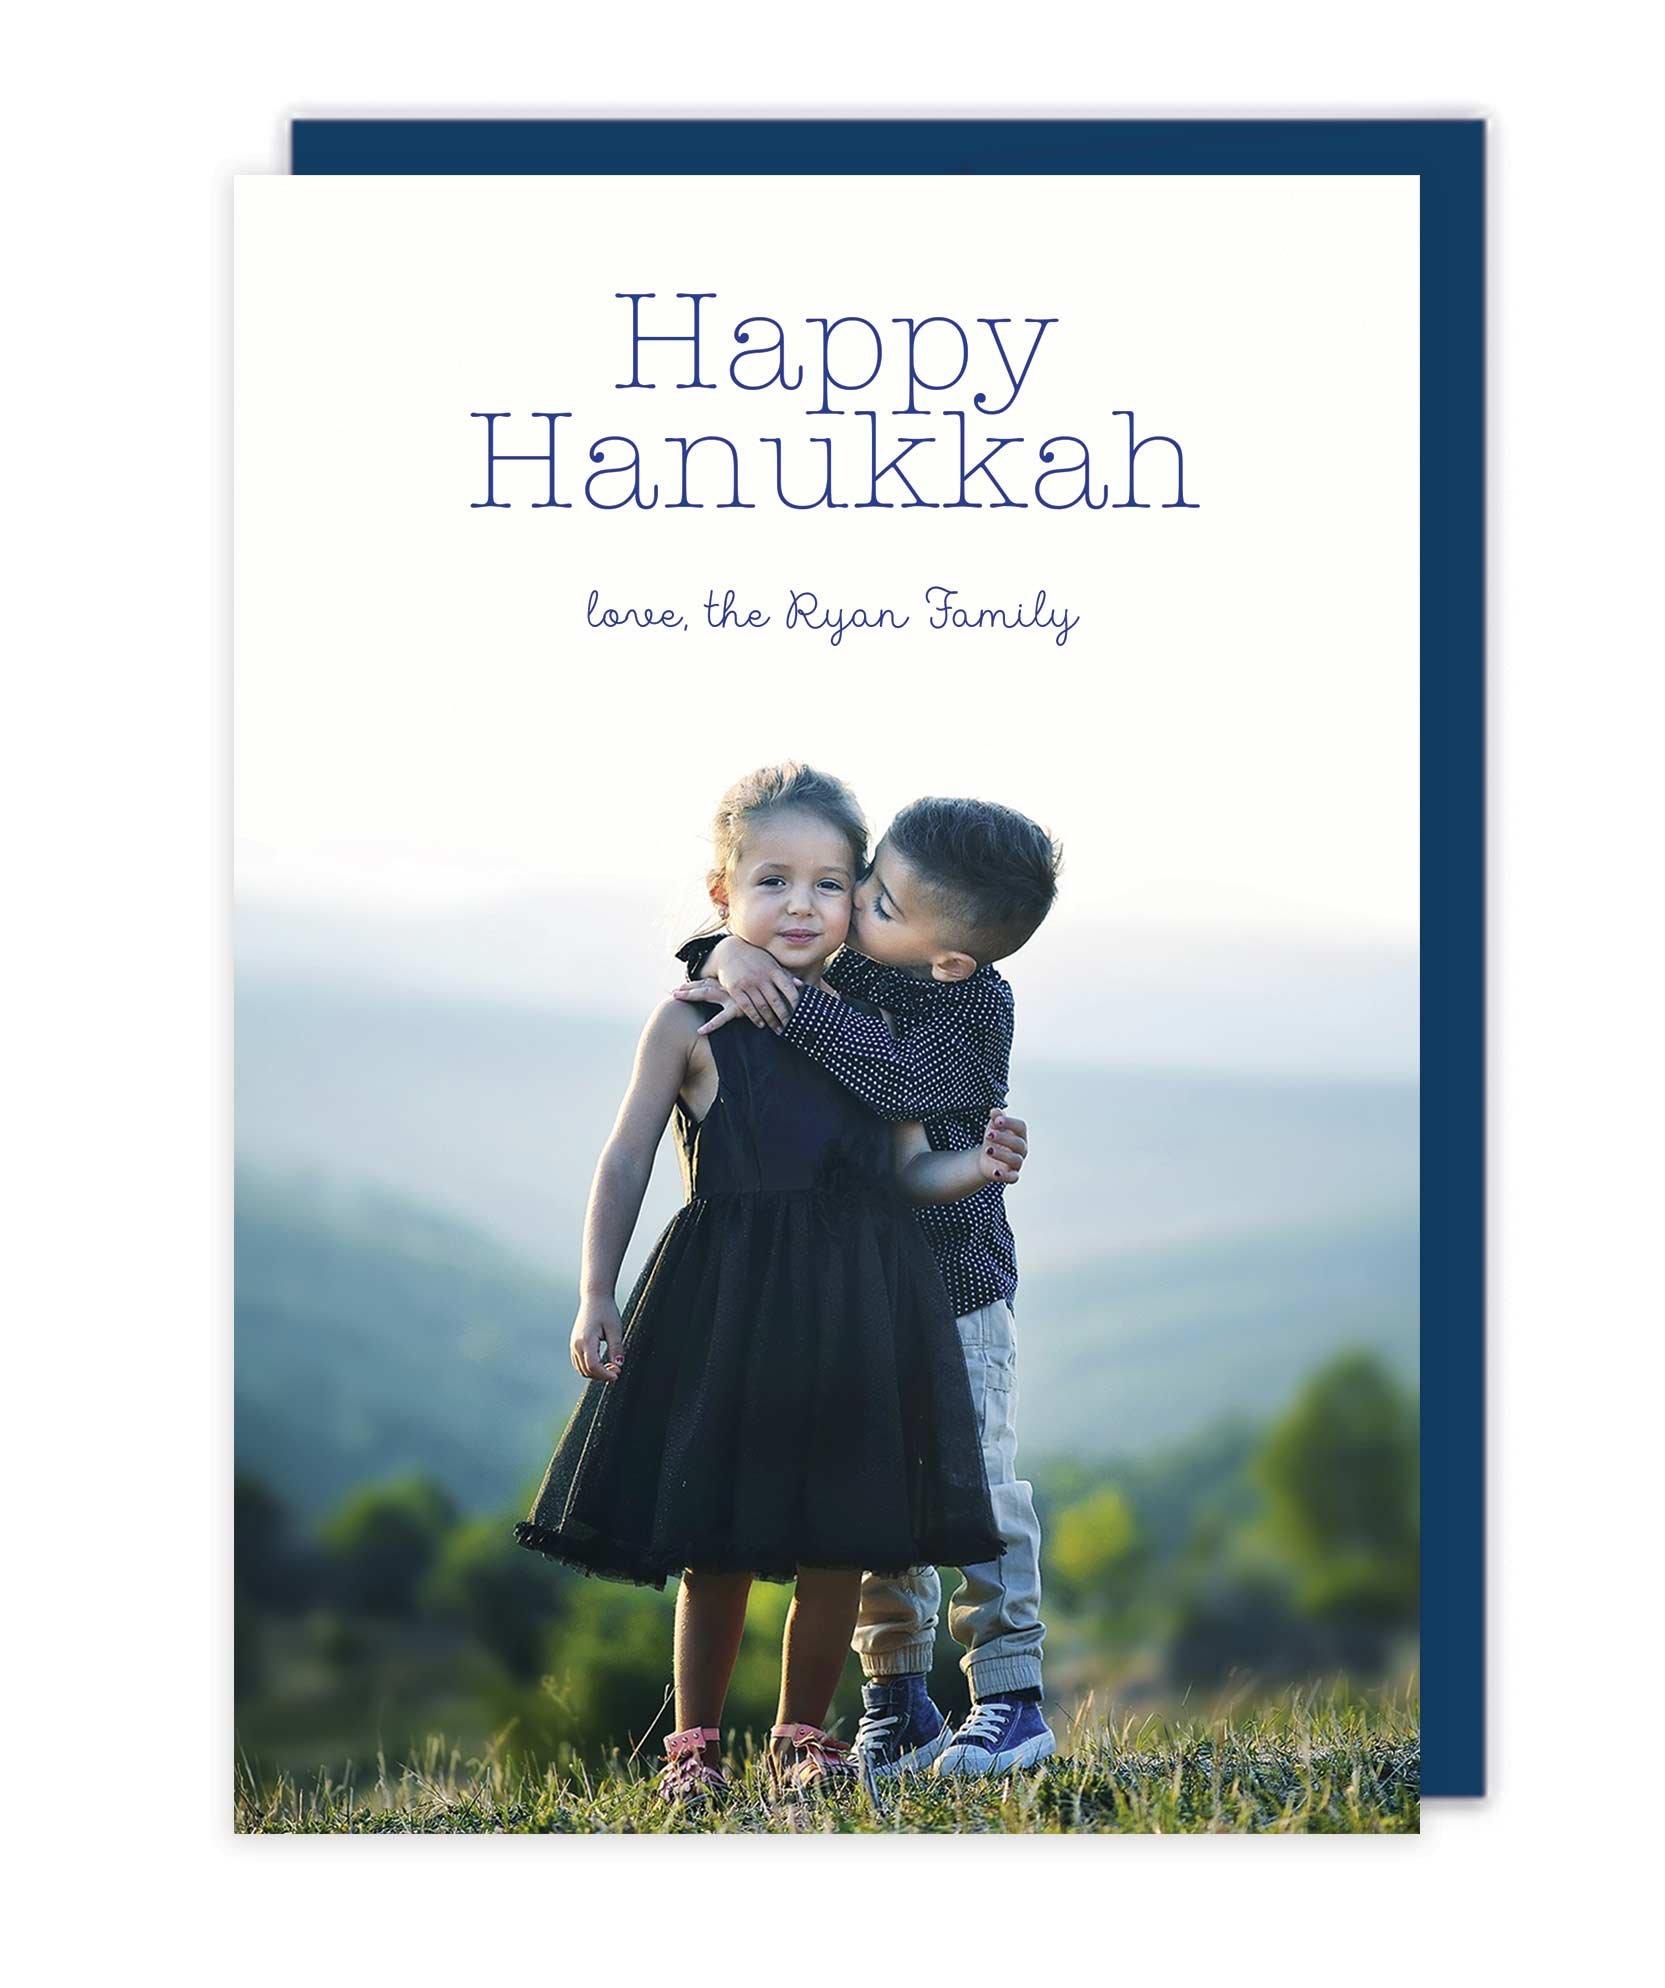 Photo Letterpress Christmas Cards - Happy Hanukkah